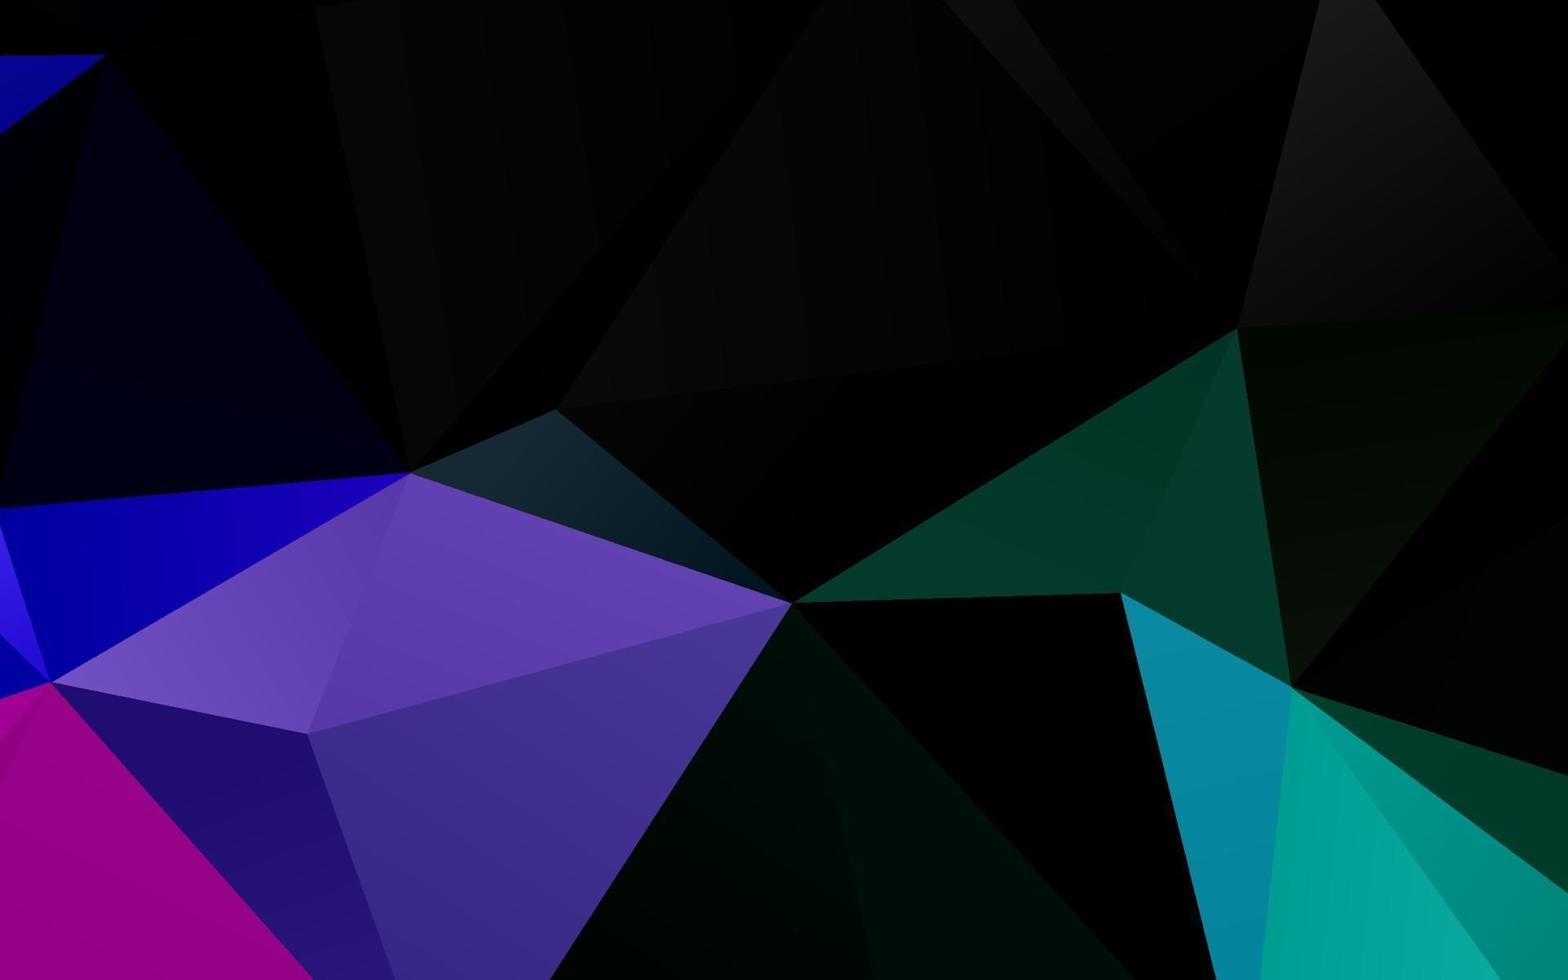 modelo de mosaico de triângulo de vetor de arco-íris multicolorido escuro.